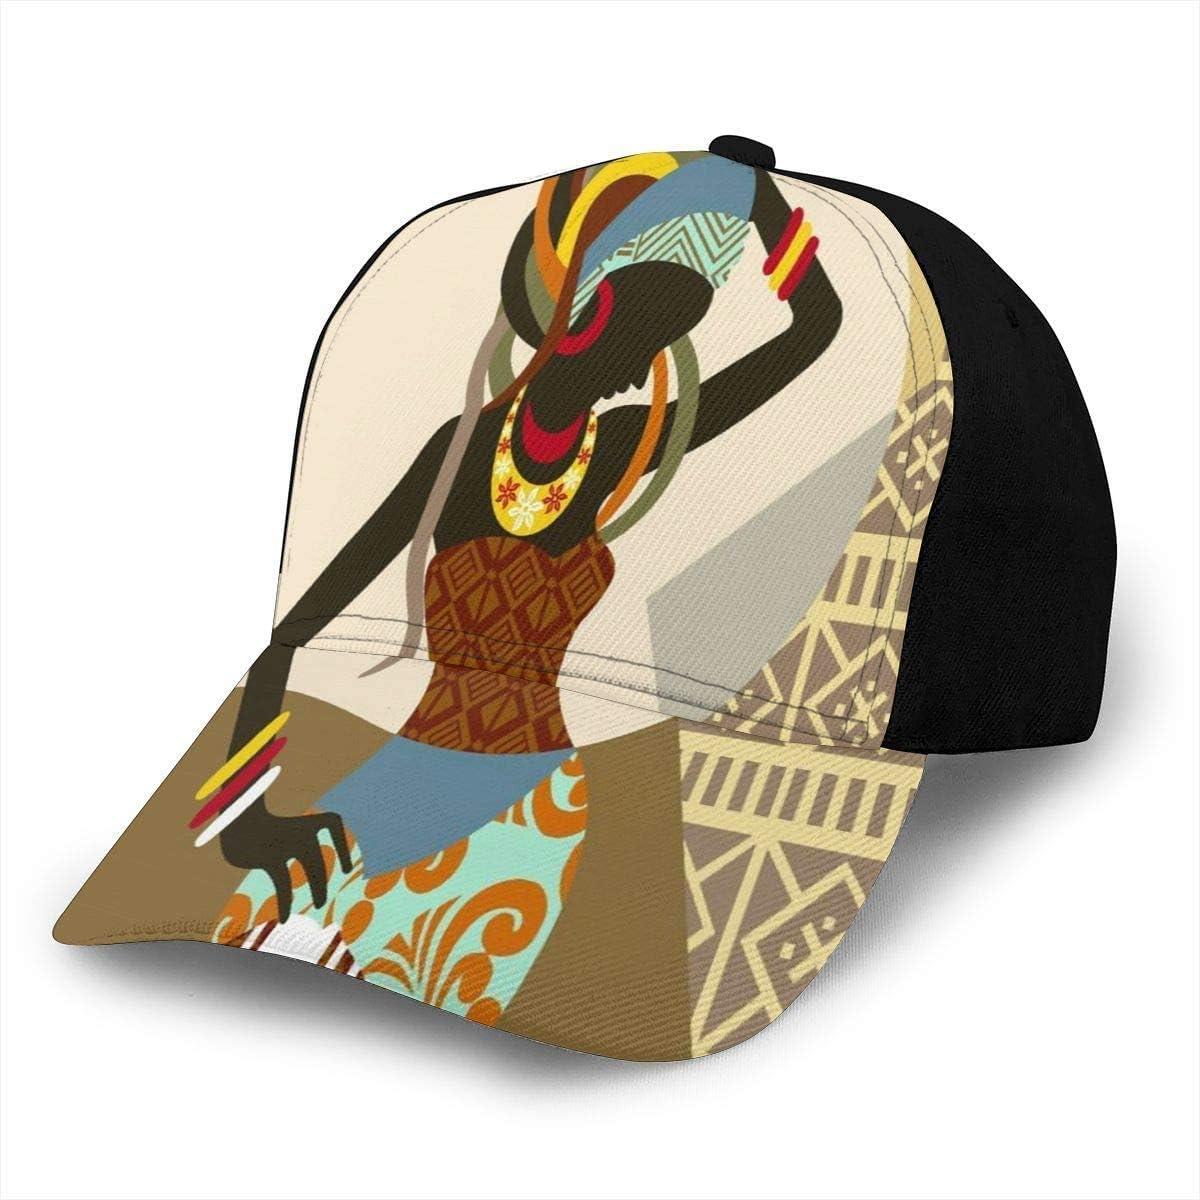 Art Design African Women Lightweight Unisex Baseball Caps Adjustable Breathable Sun Hat for Sport Outdoor Black